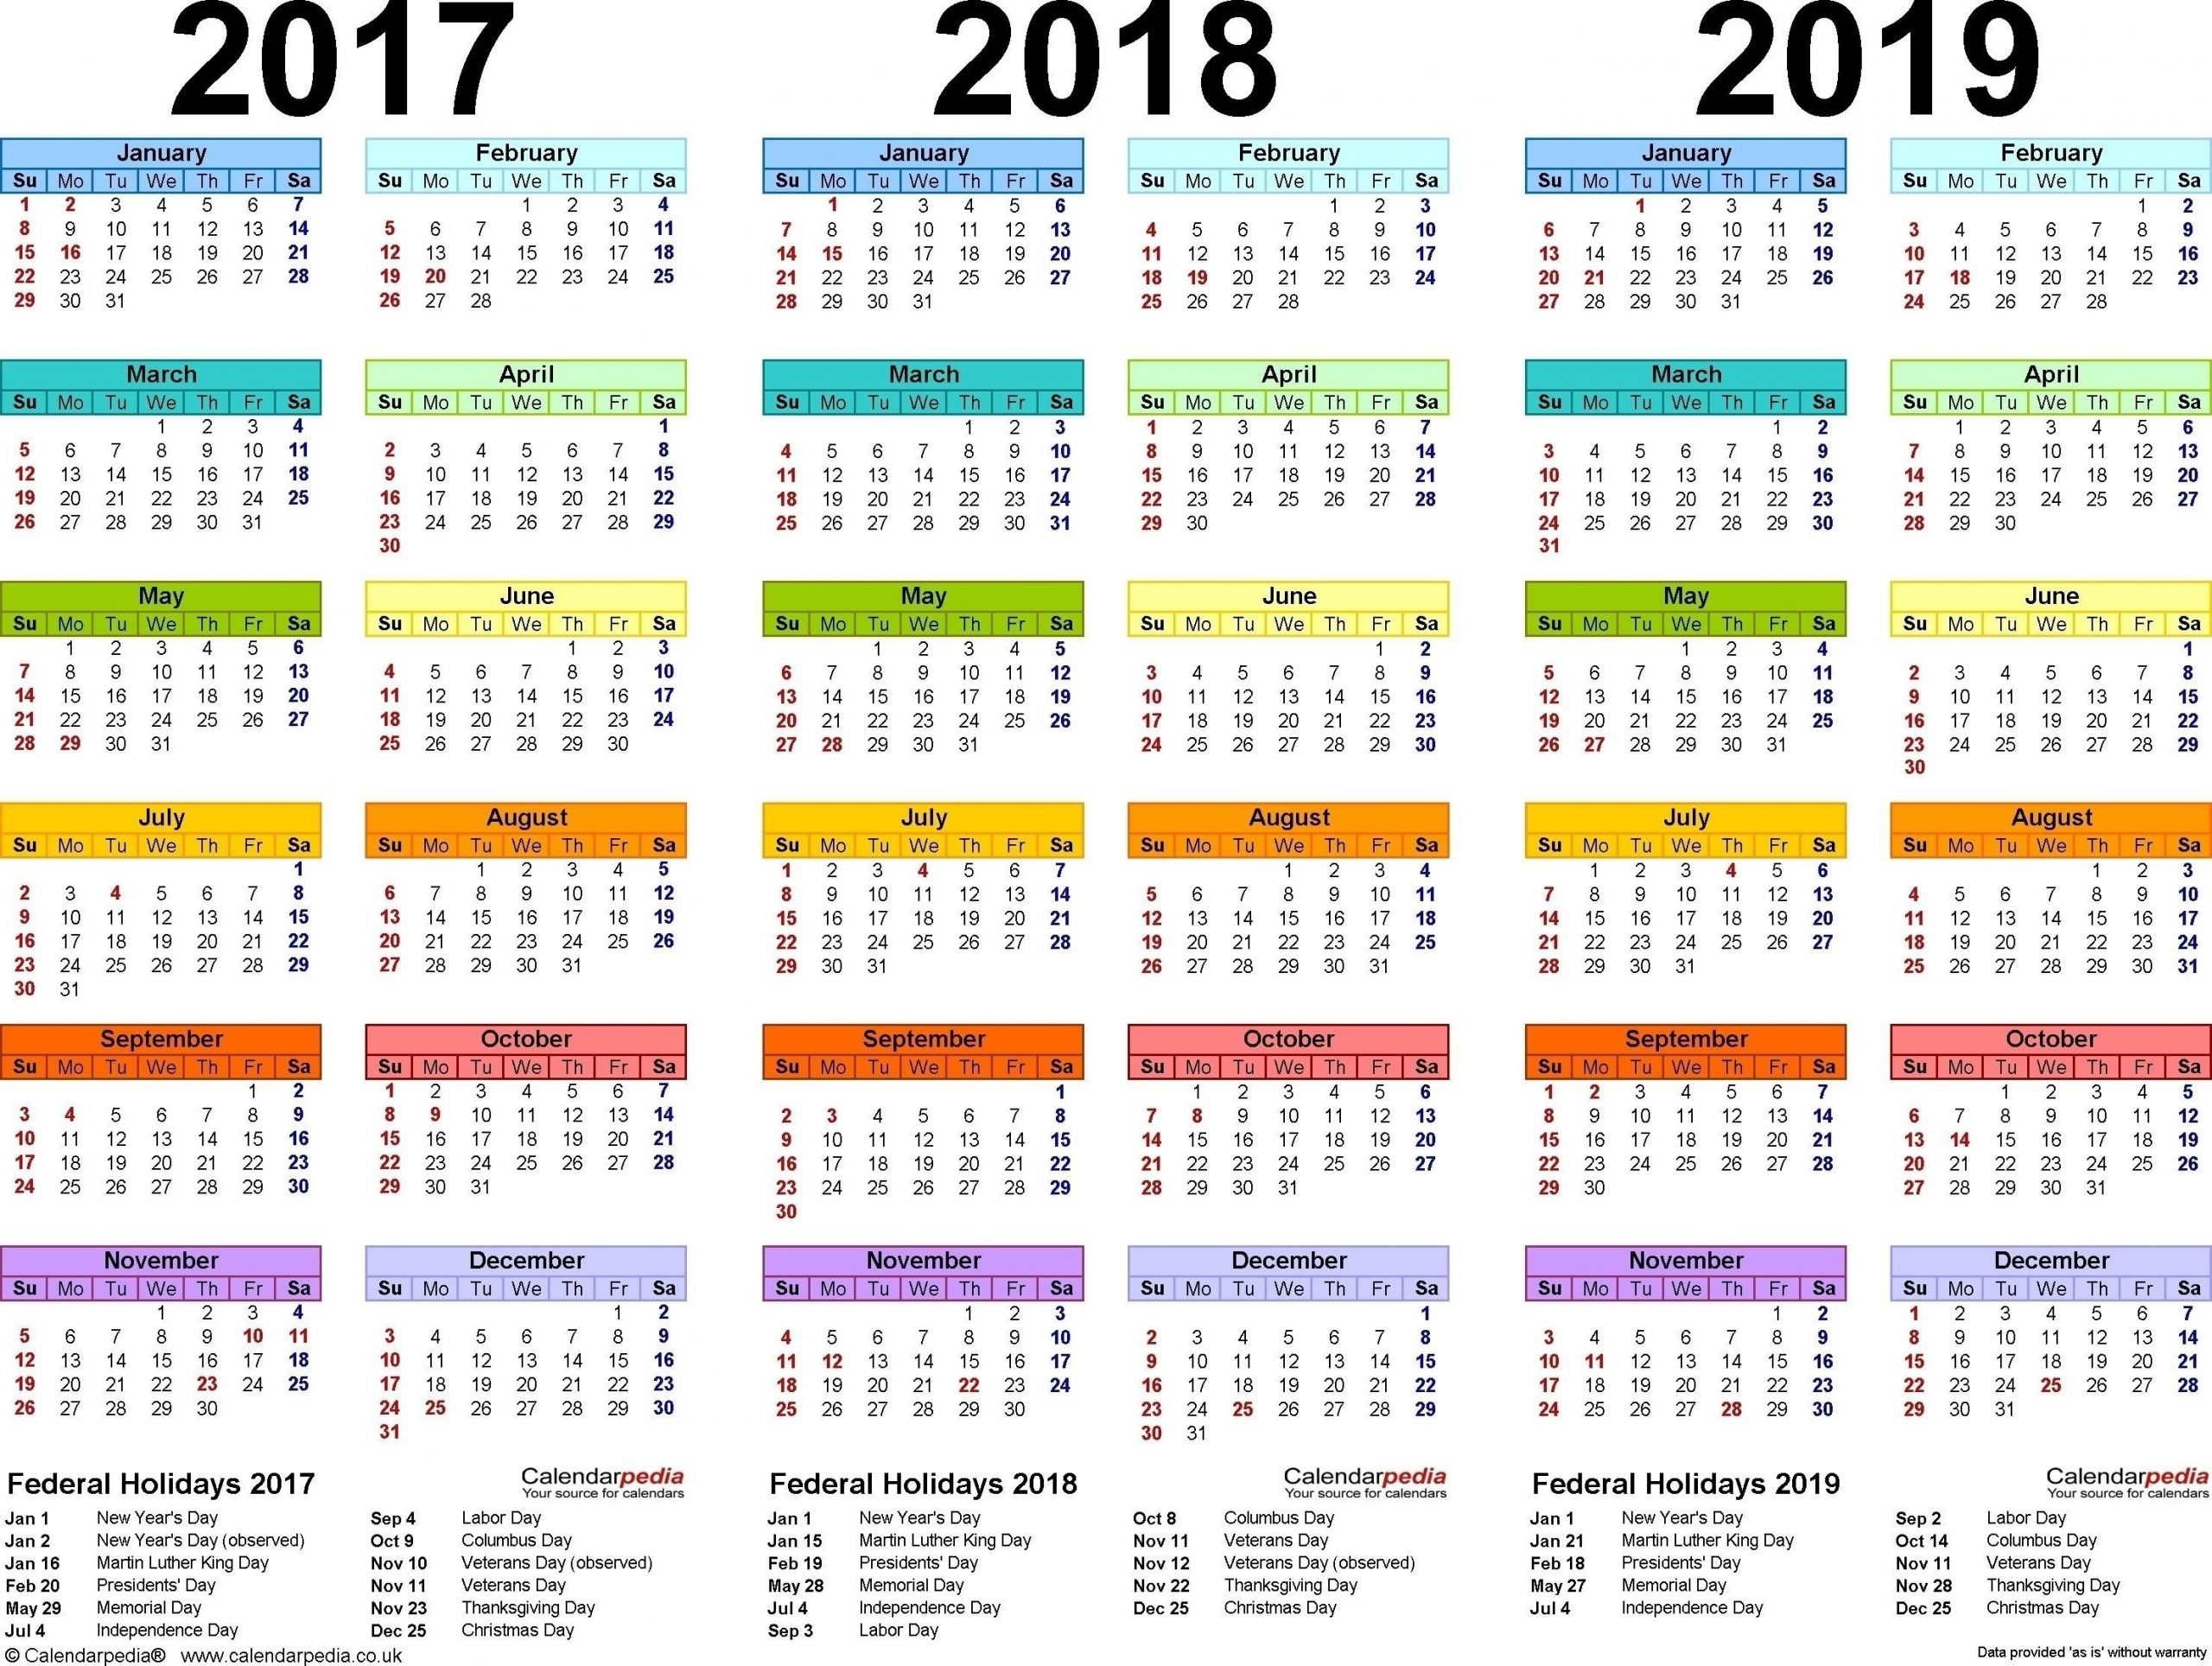 Depo-Provera Calendar 2021 Pdf - Template Calendar Design throughout Depo Provera Schedule 2021 Image